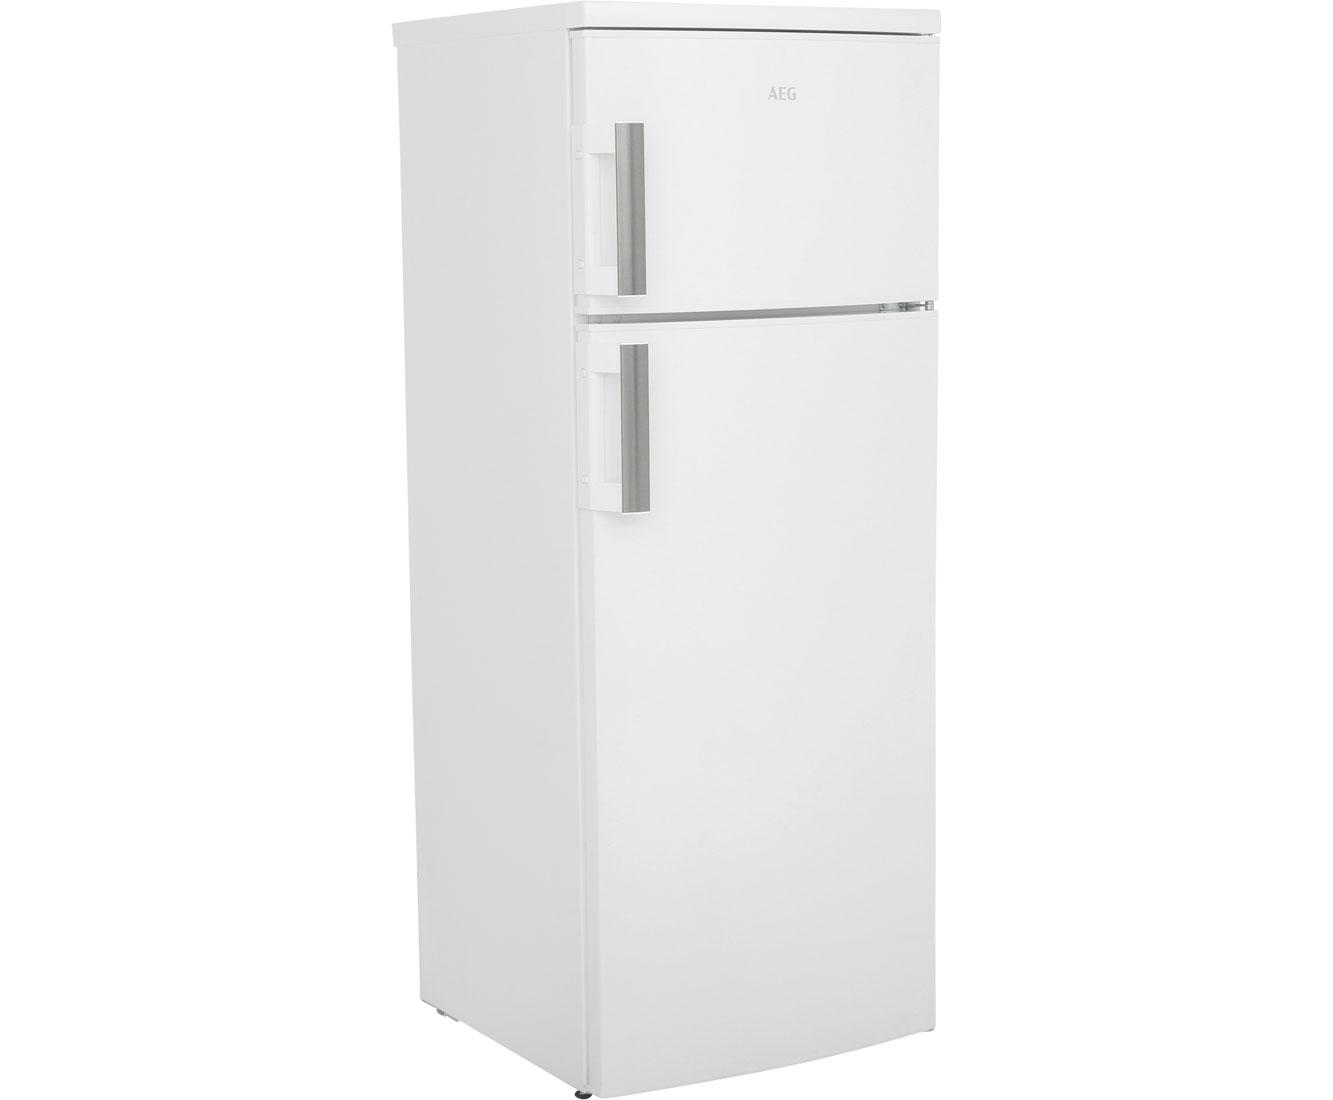 Aeg Kühlschrank Idealo : Aeg santo rdb aw kühl gefrierkombination weiß a